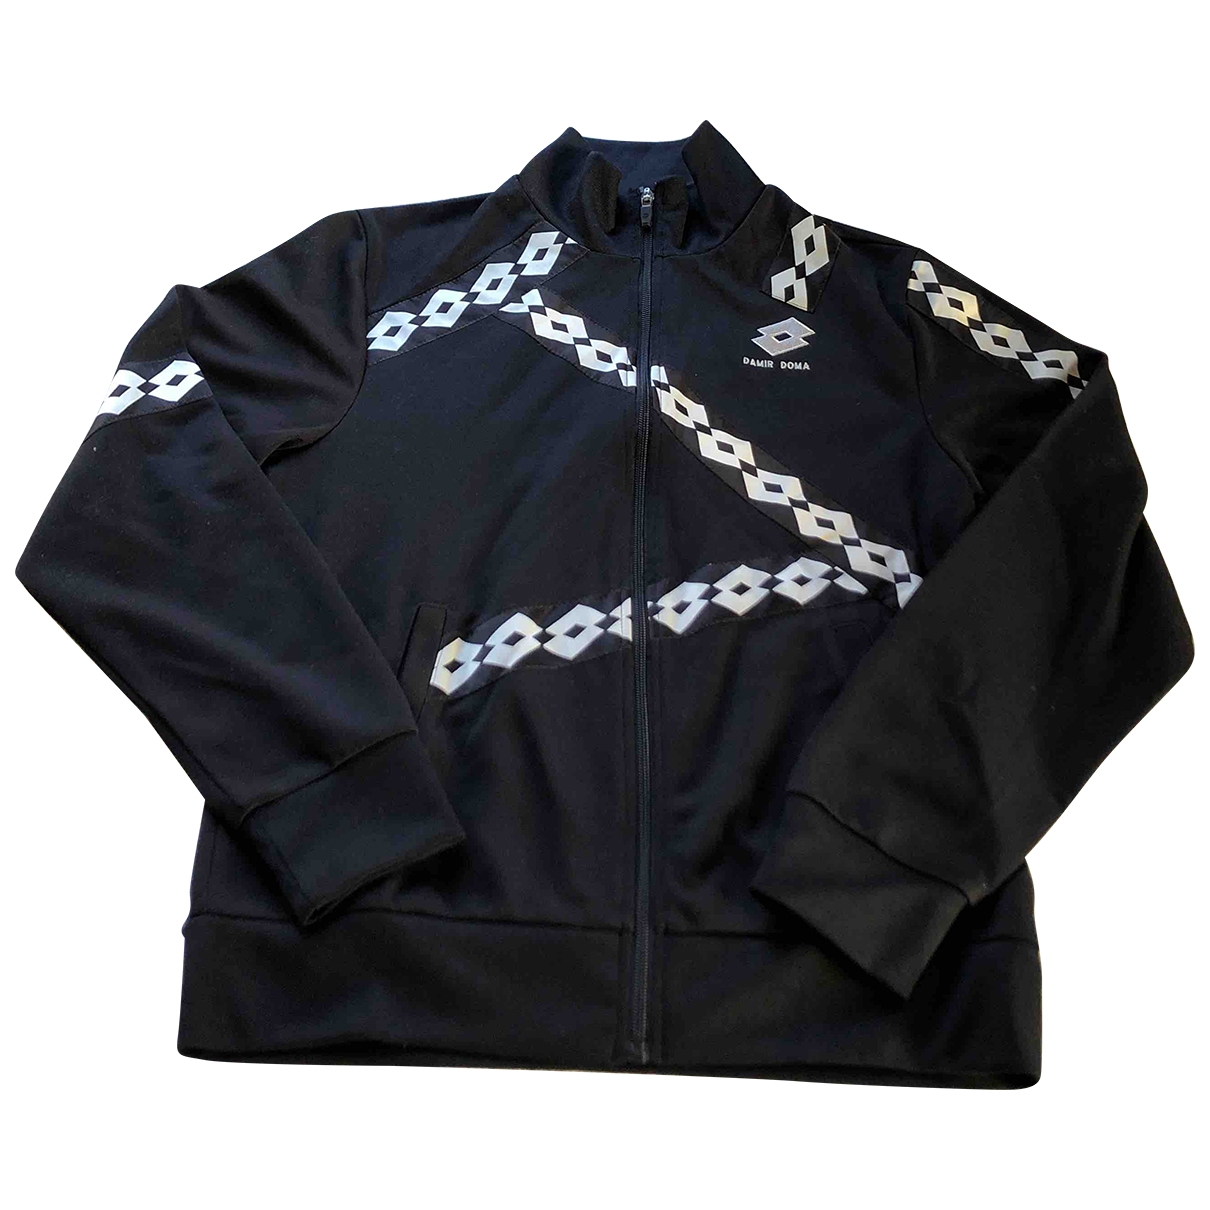 Lotto \N Jacke in  Schwarz Polyester